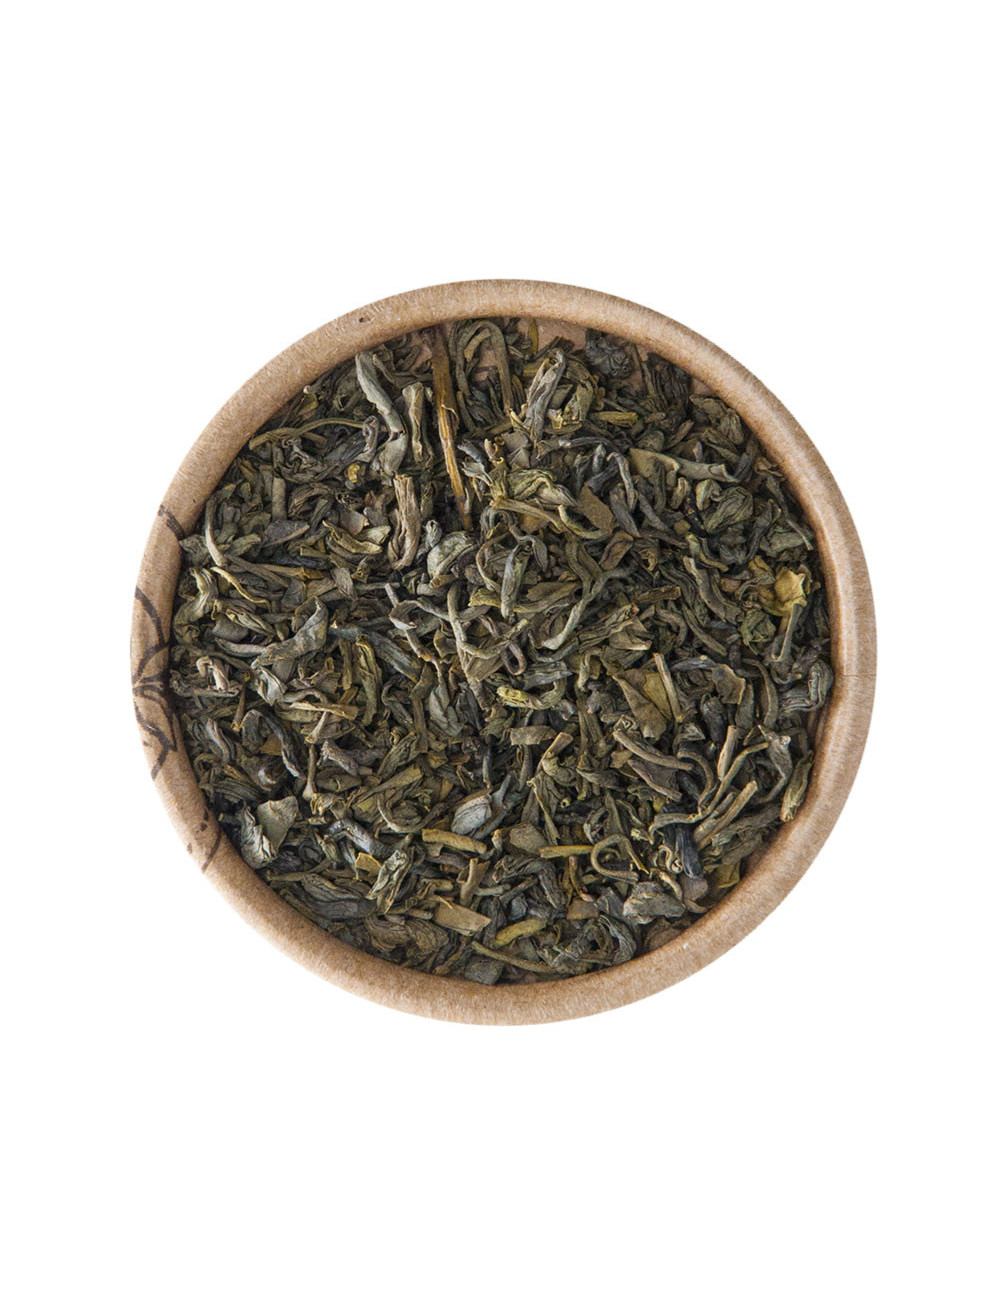 Chun Mee BIO tè verde - La Pianta del Tè shop online